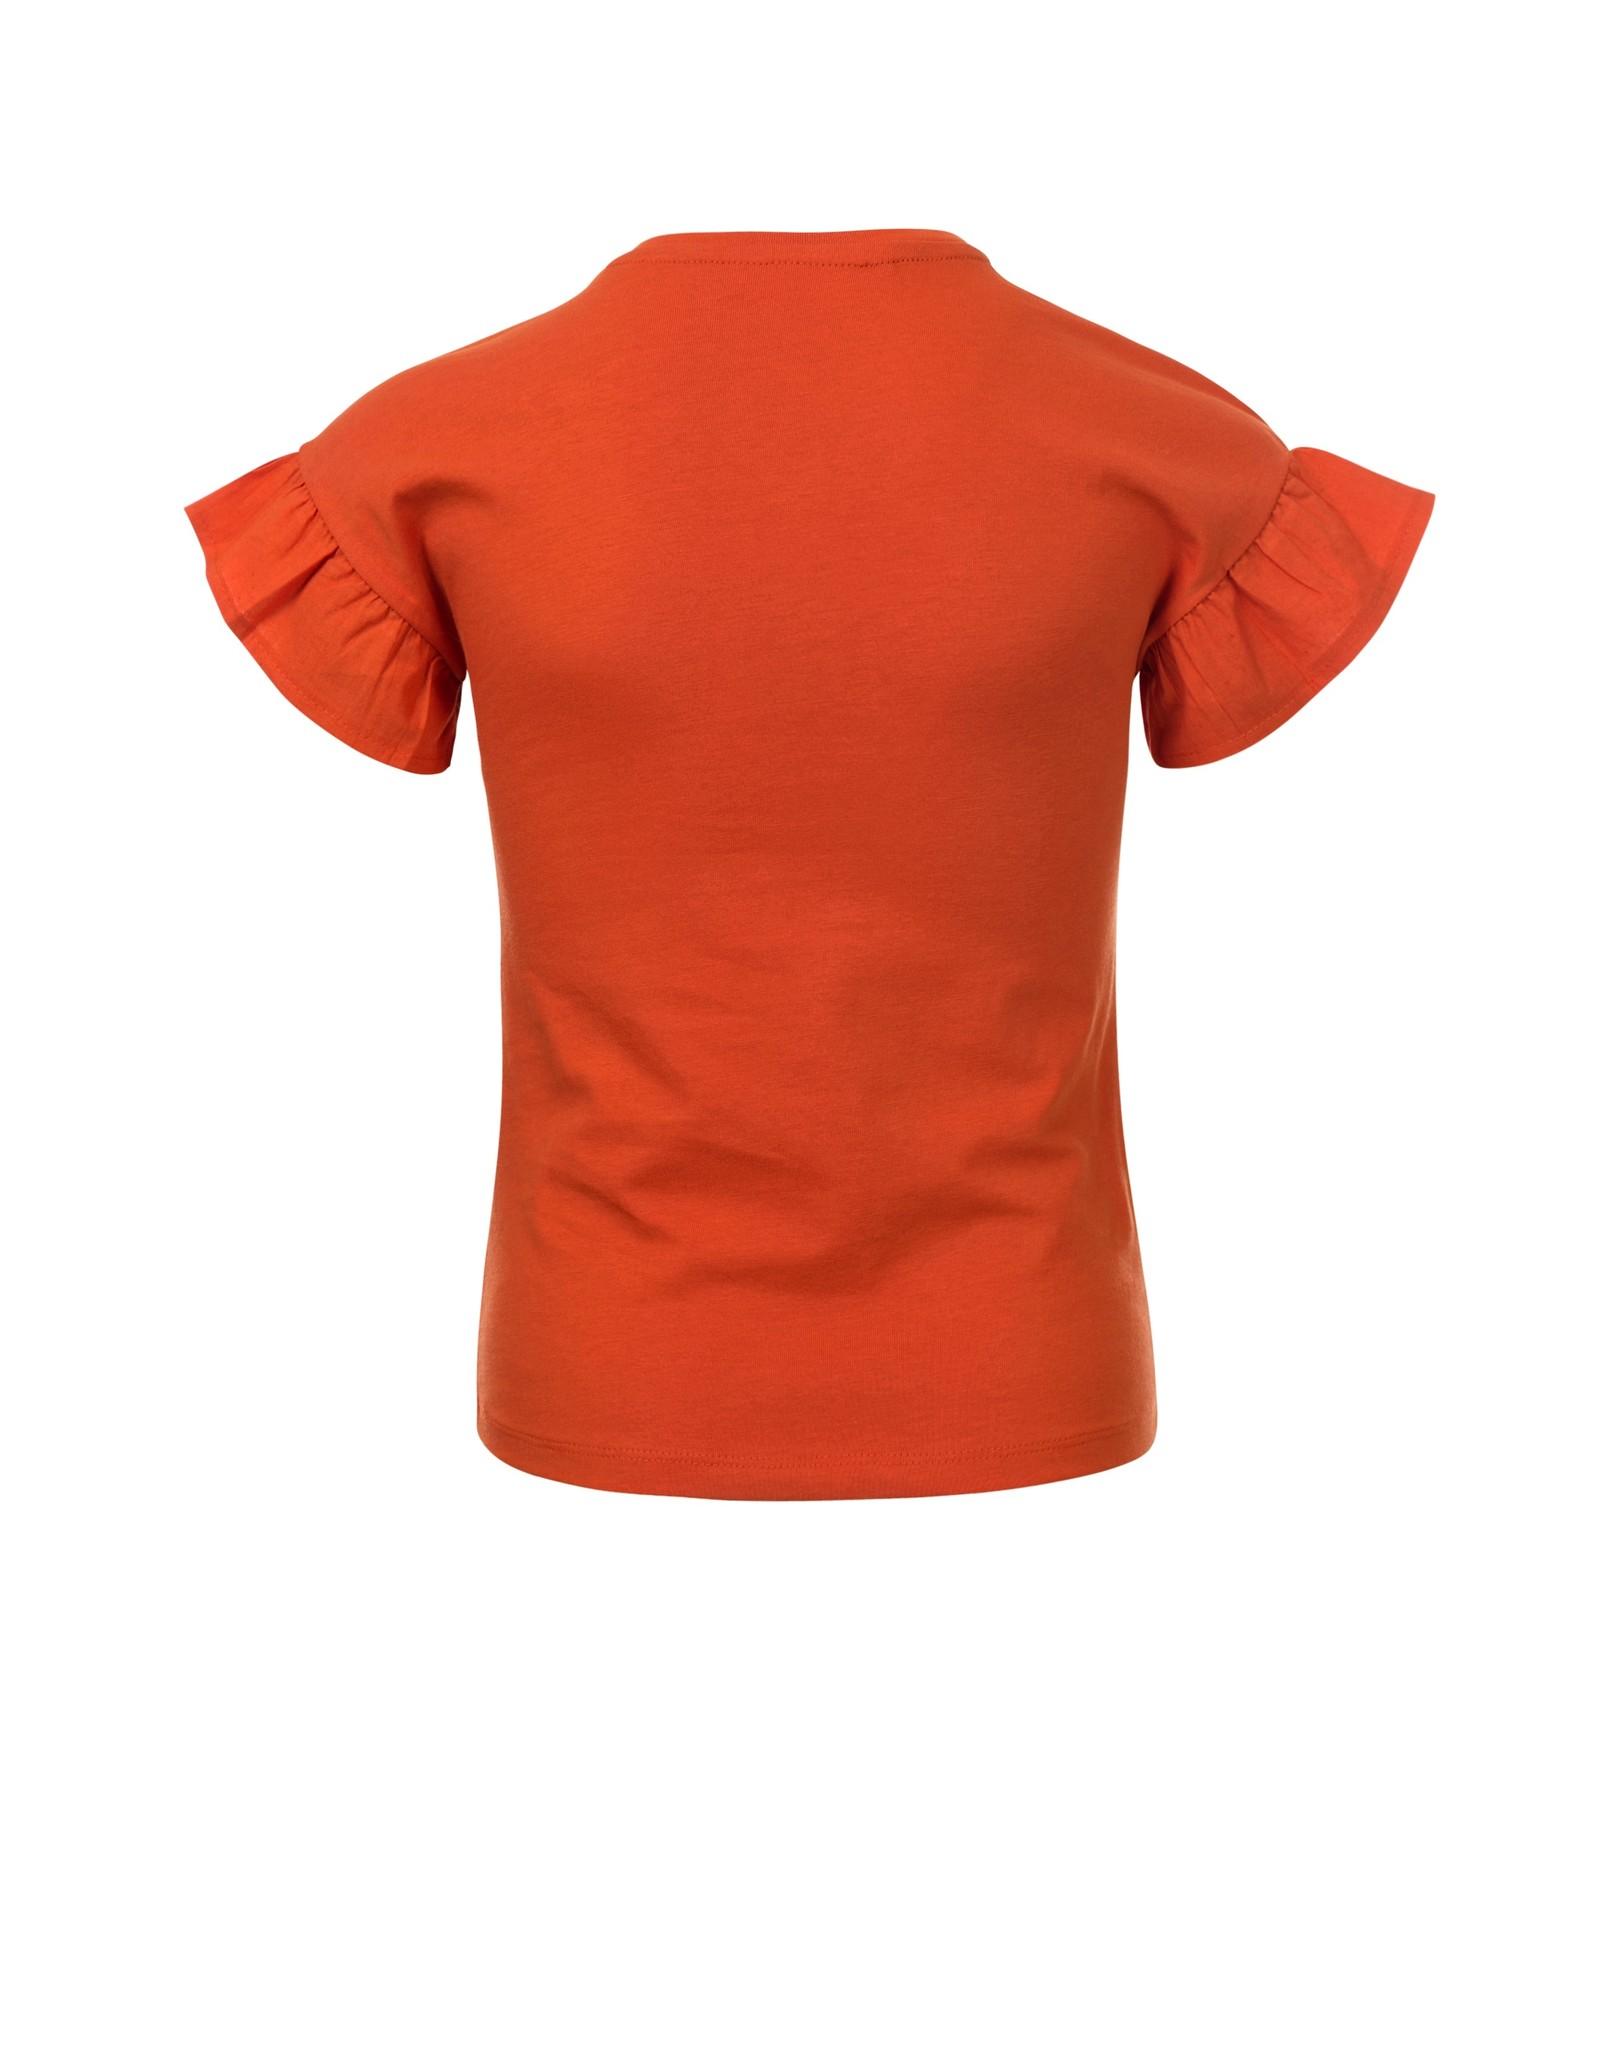 Looxs Revolution Little t-shirt poplin ruffle